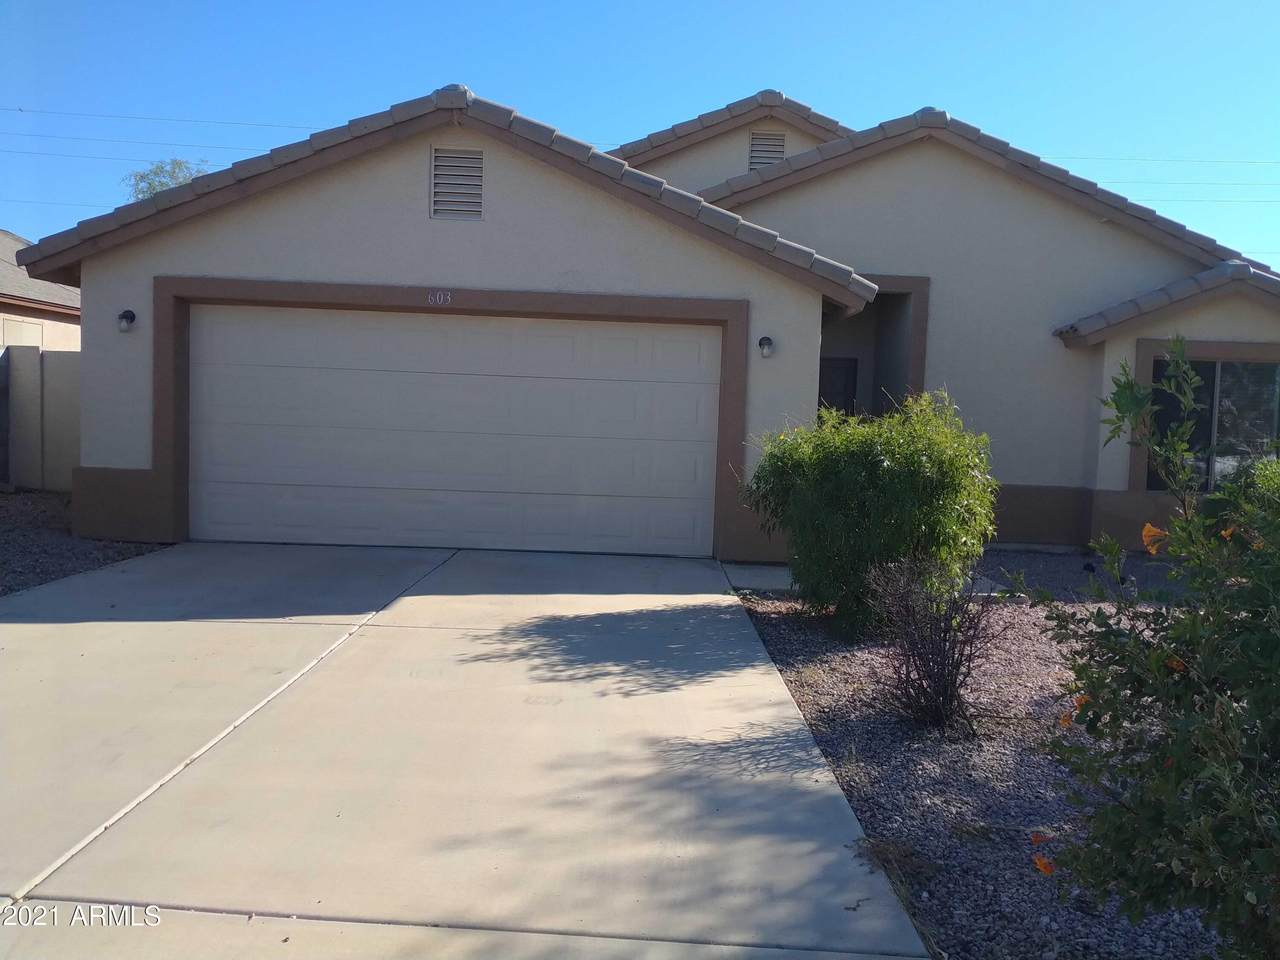 603 Sierra Vista Drive - Photo 1